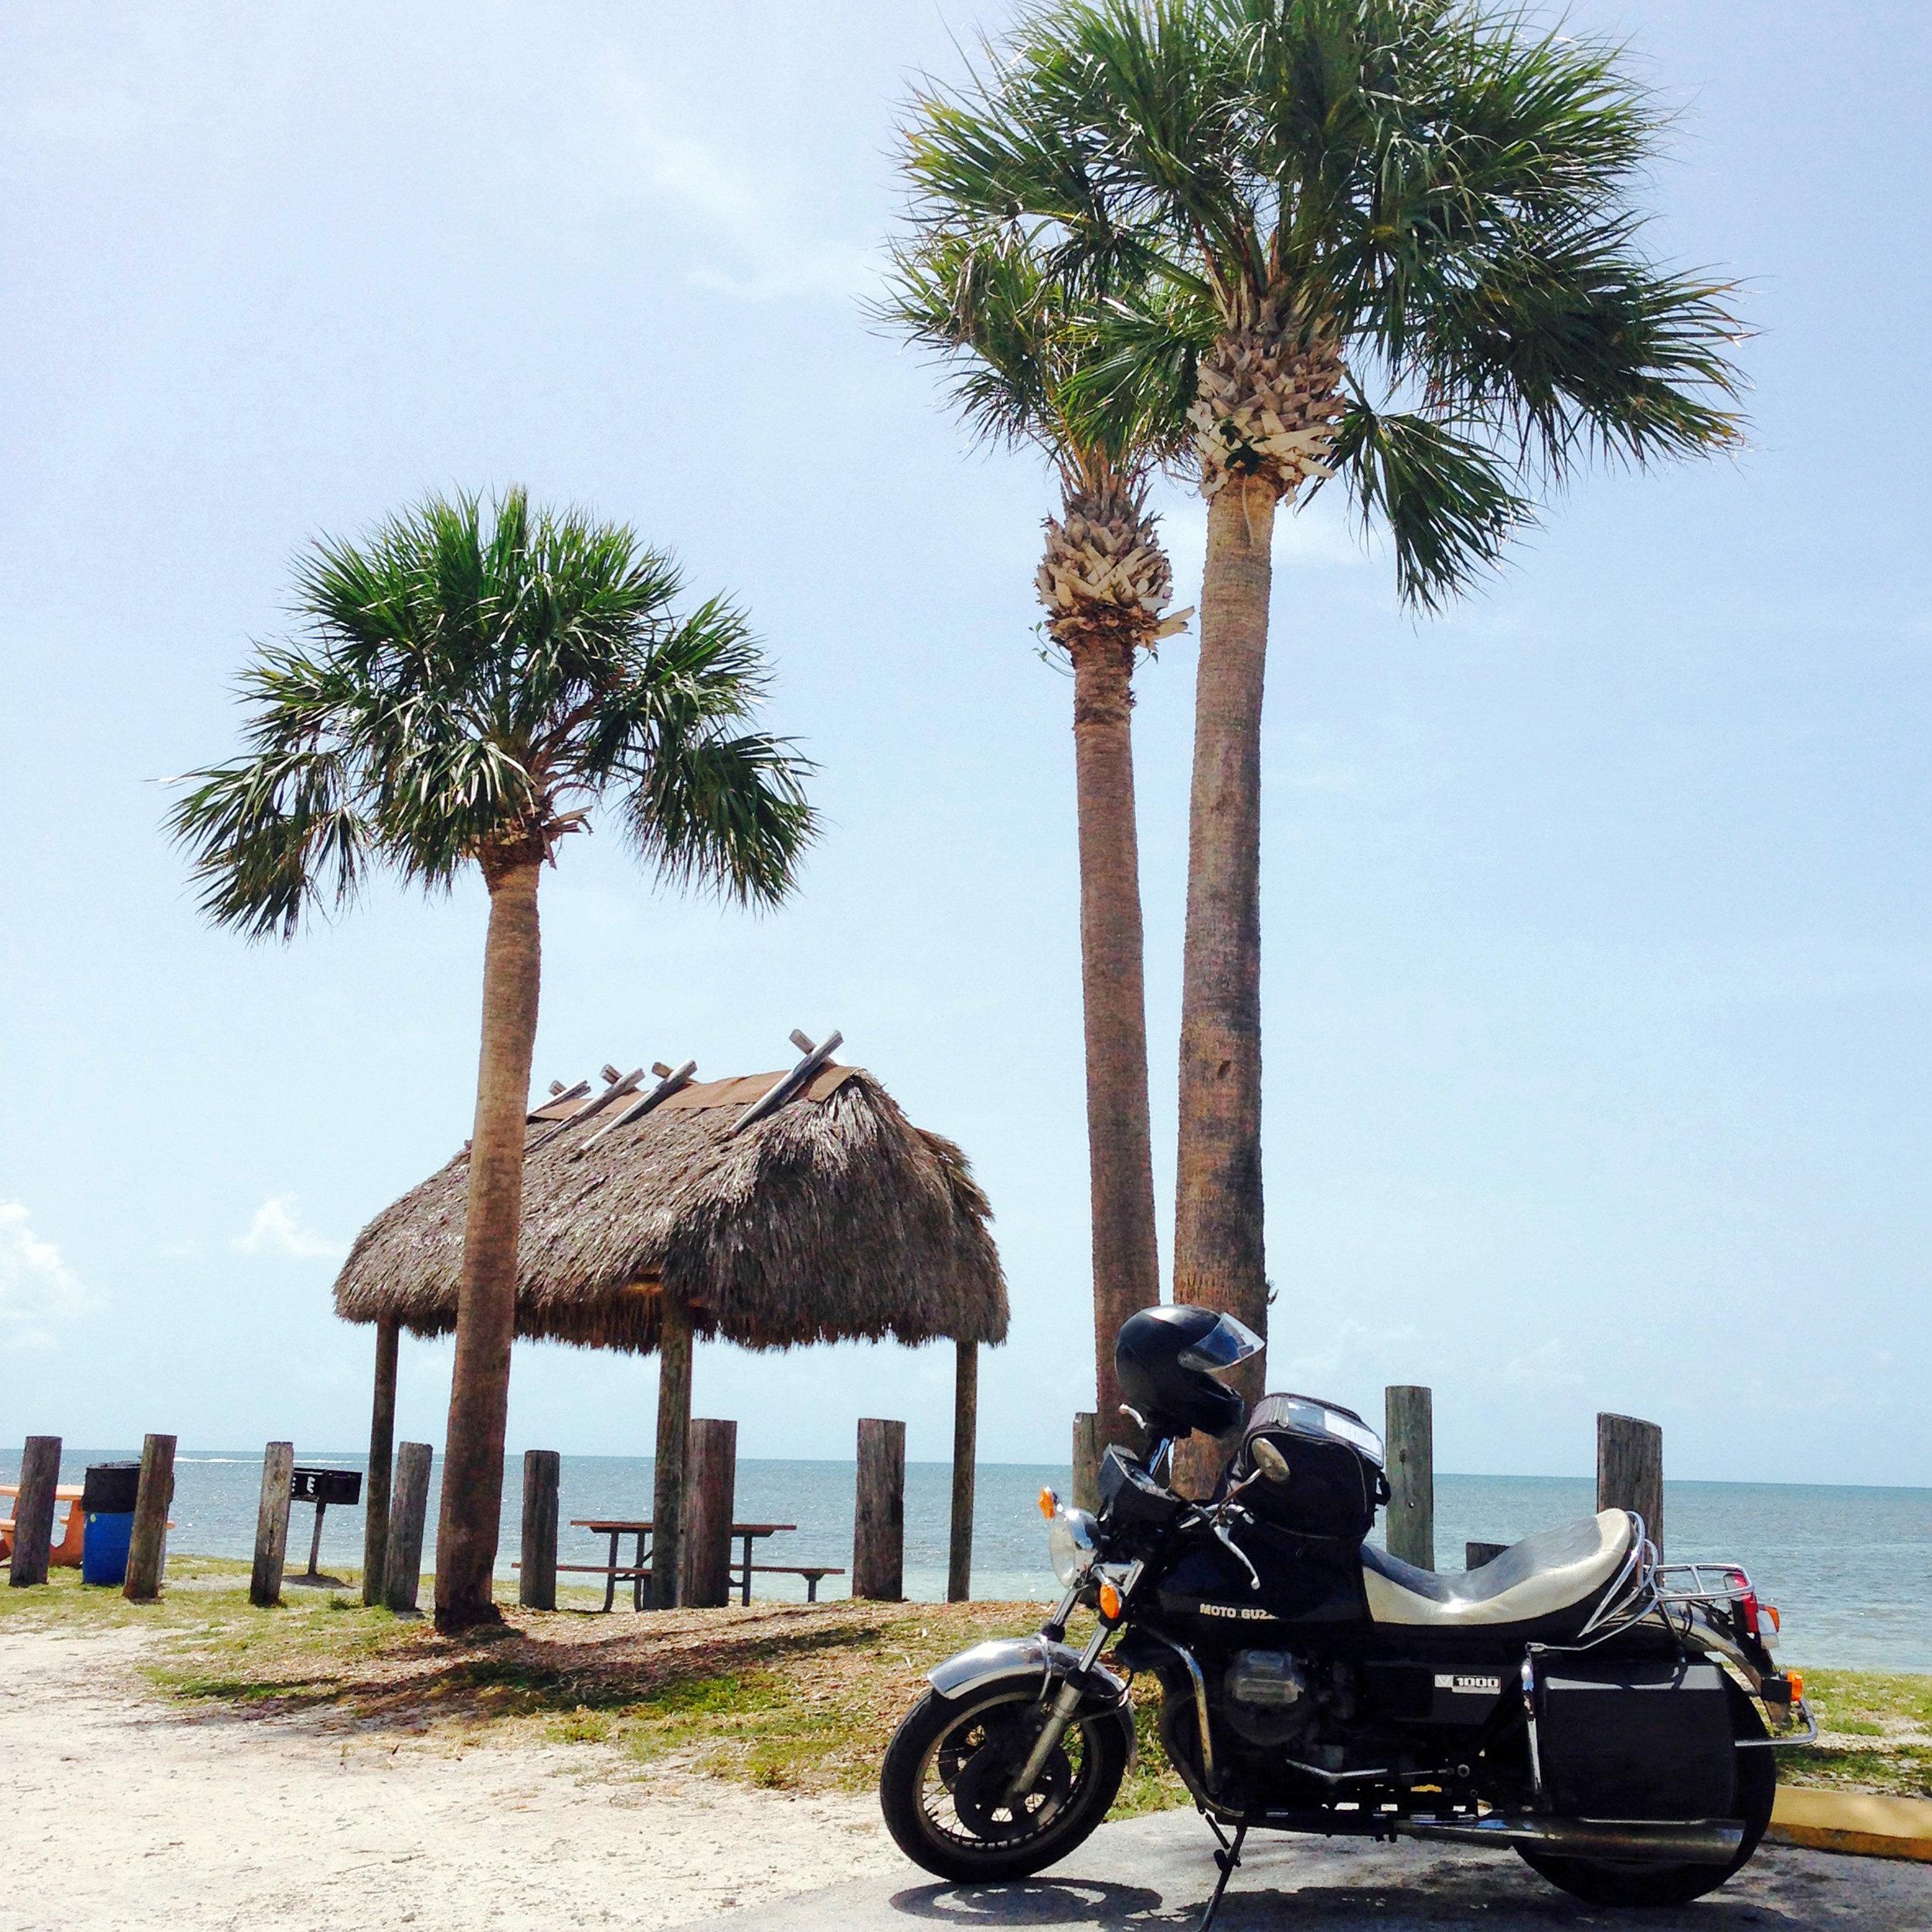 Yendo a Key West, Florida